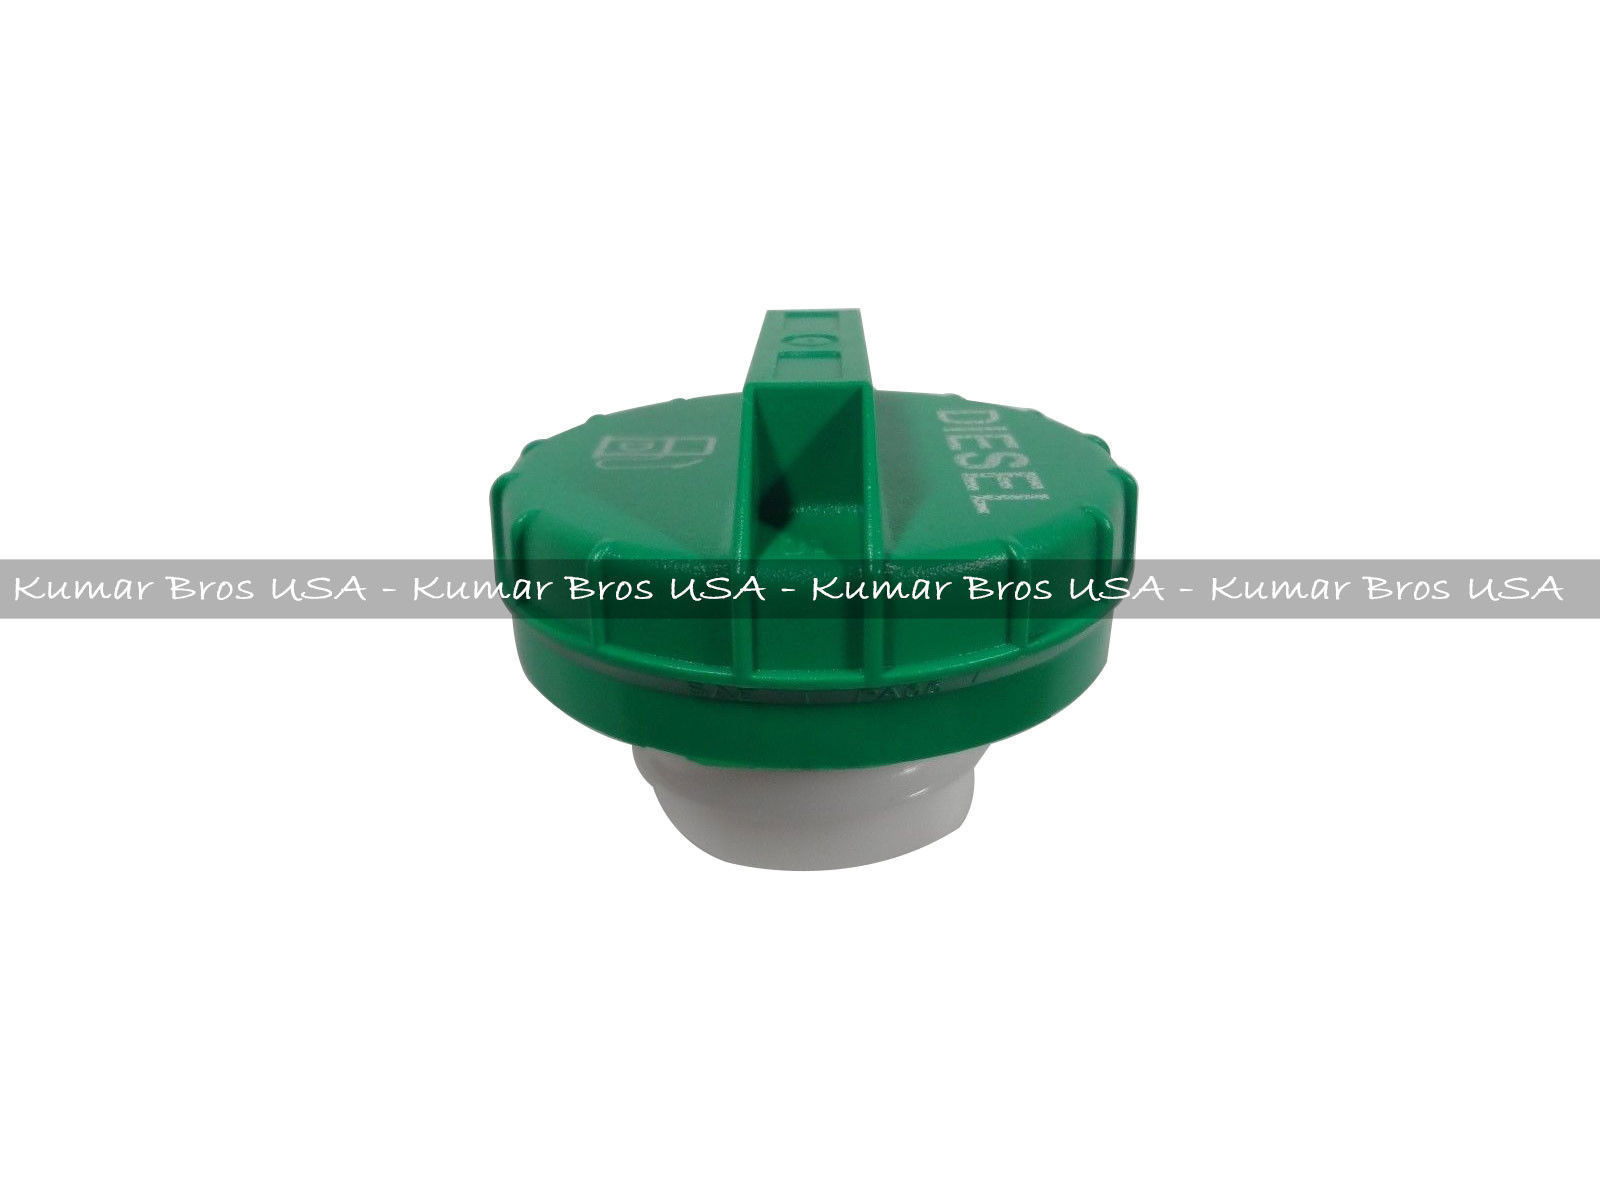 New Kumar Bros USA Diesel Fuel Cap for Bobcat 863 864 873 883 963